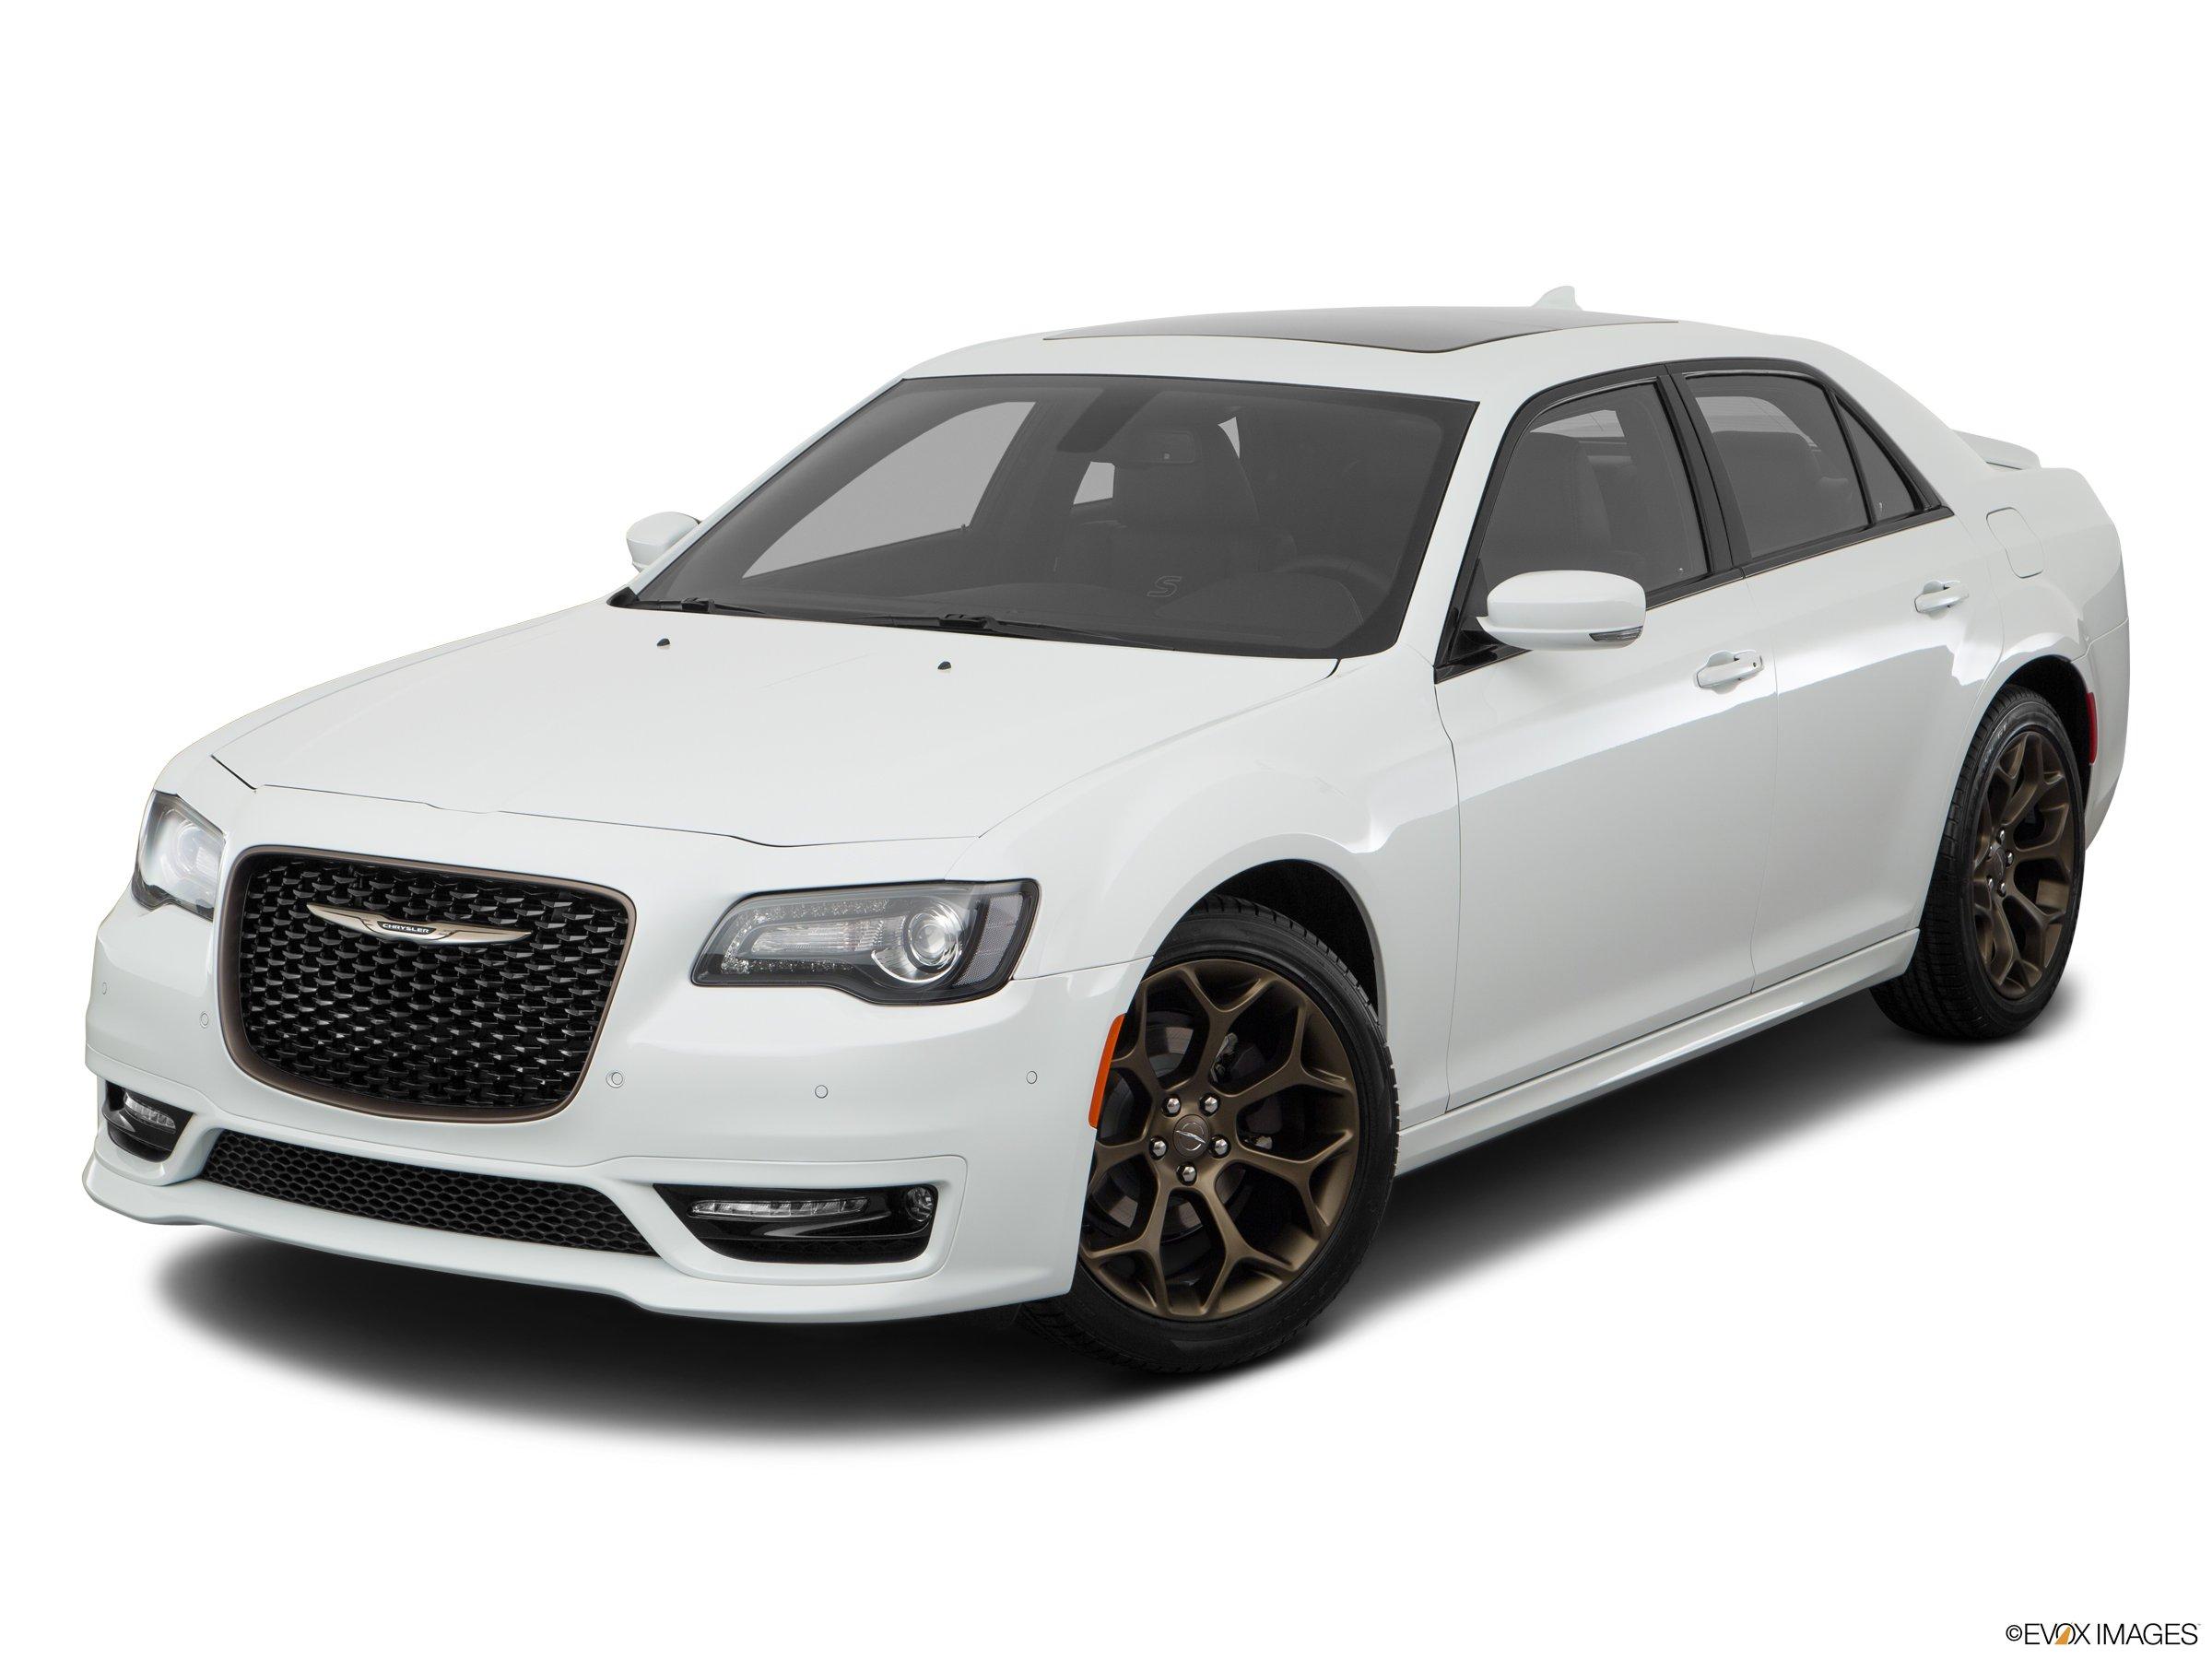 2020 Chrysler 300 S RWD sedan